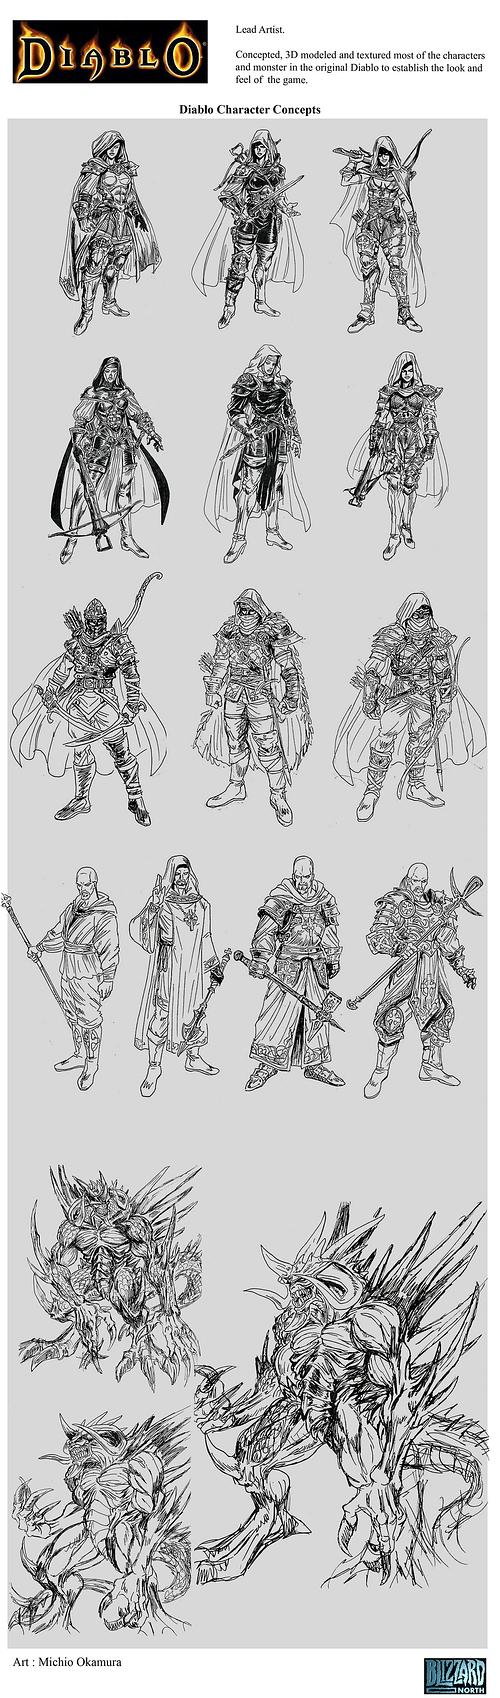 Diablo 1 Unseen Art by Michio Okamura. Diablo Character Concepts.